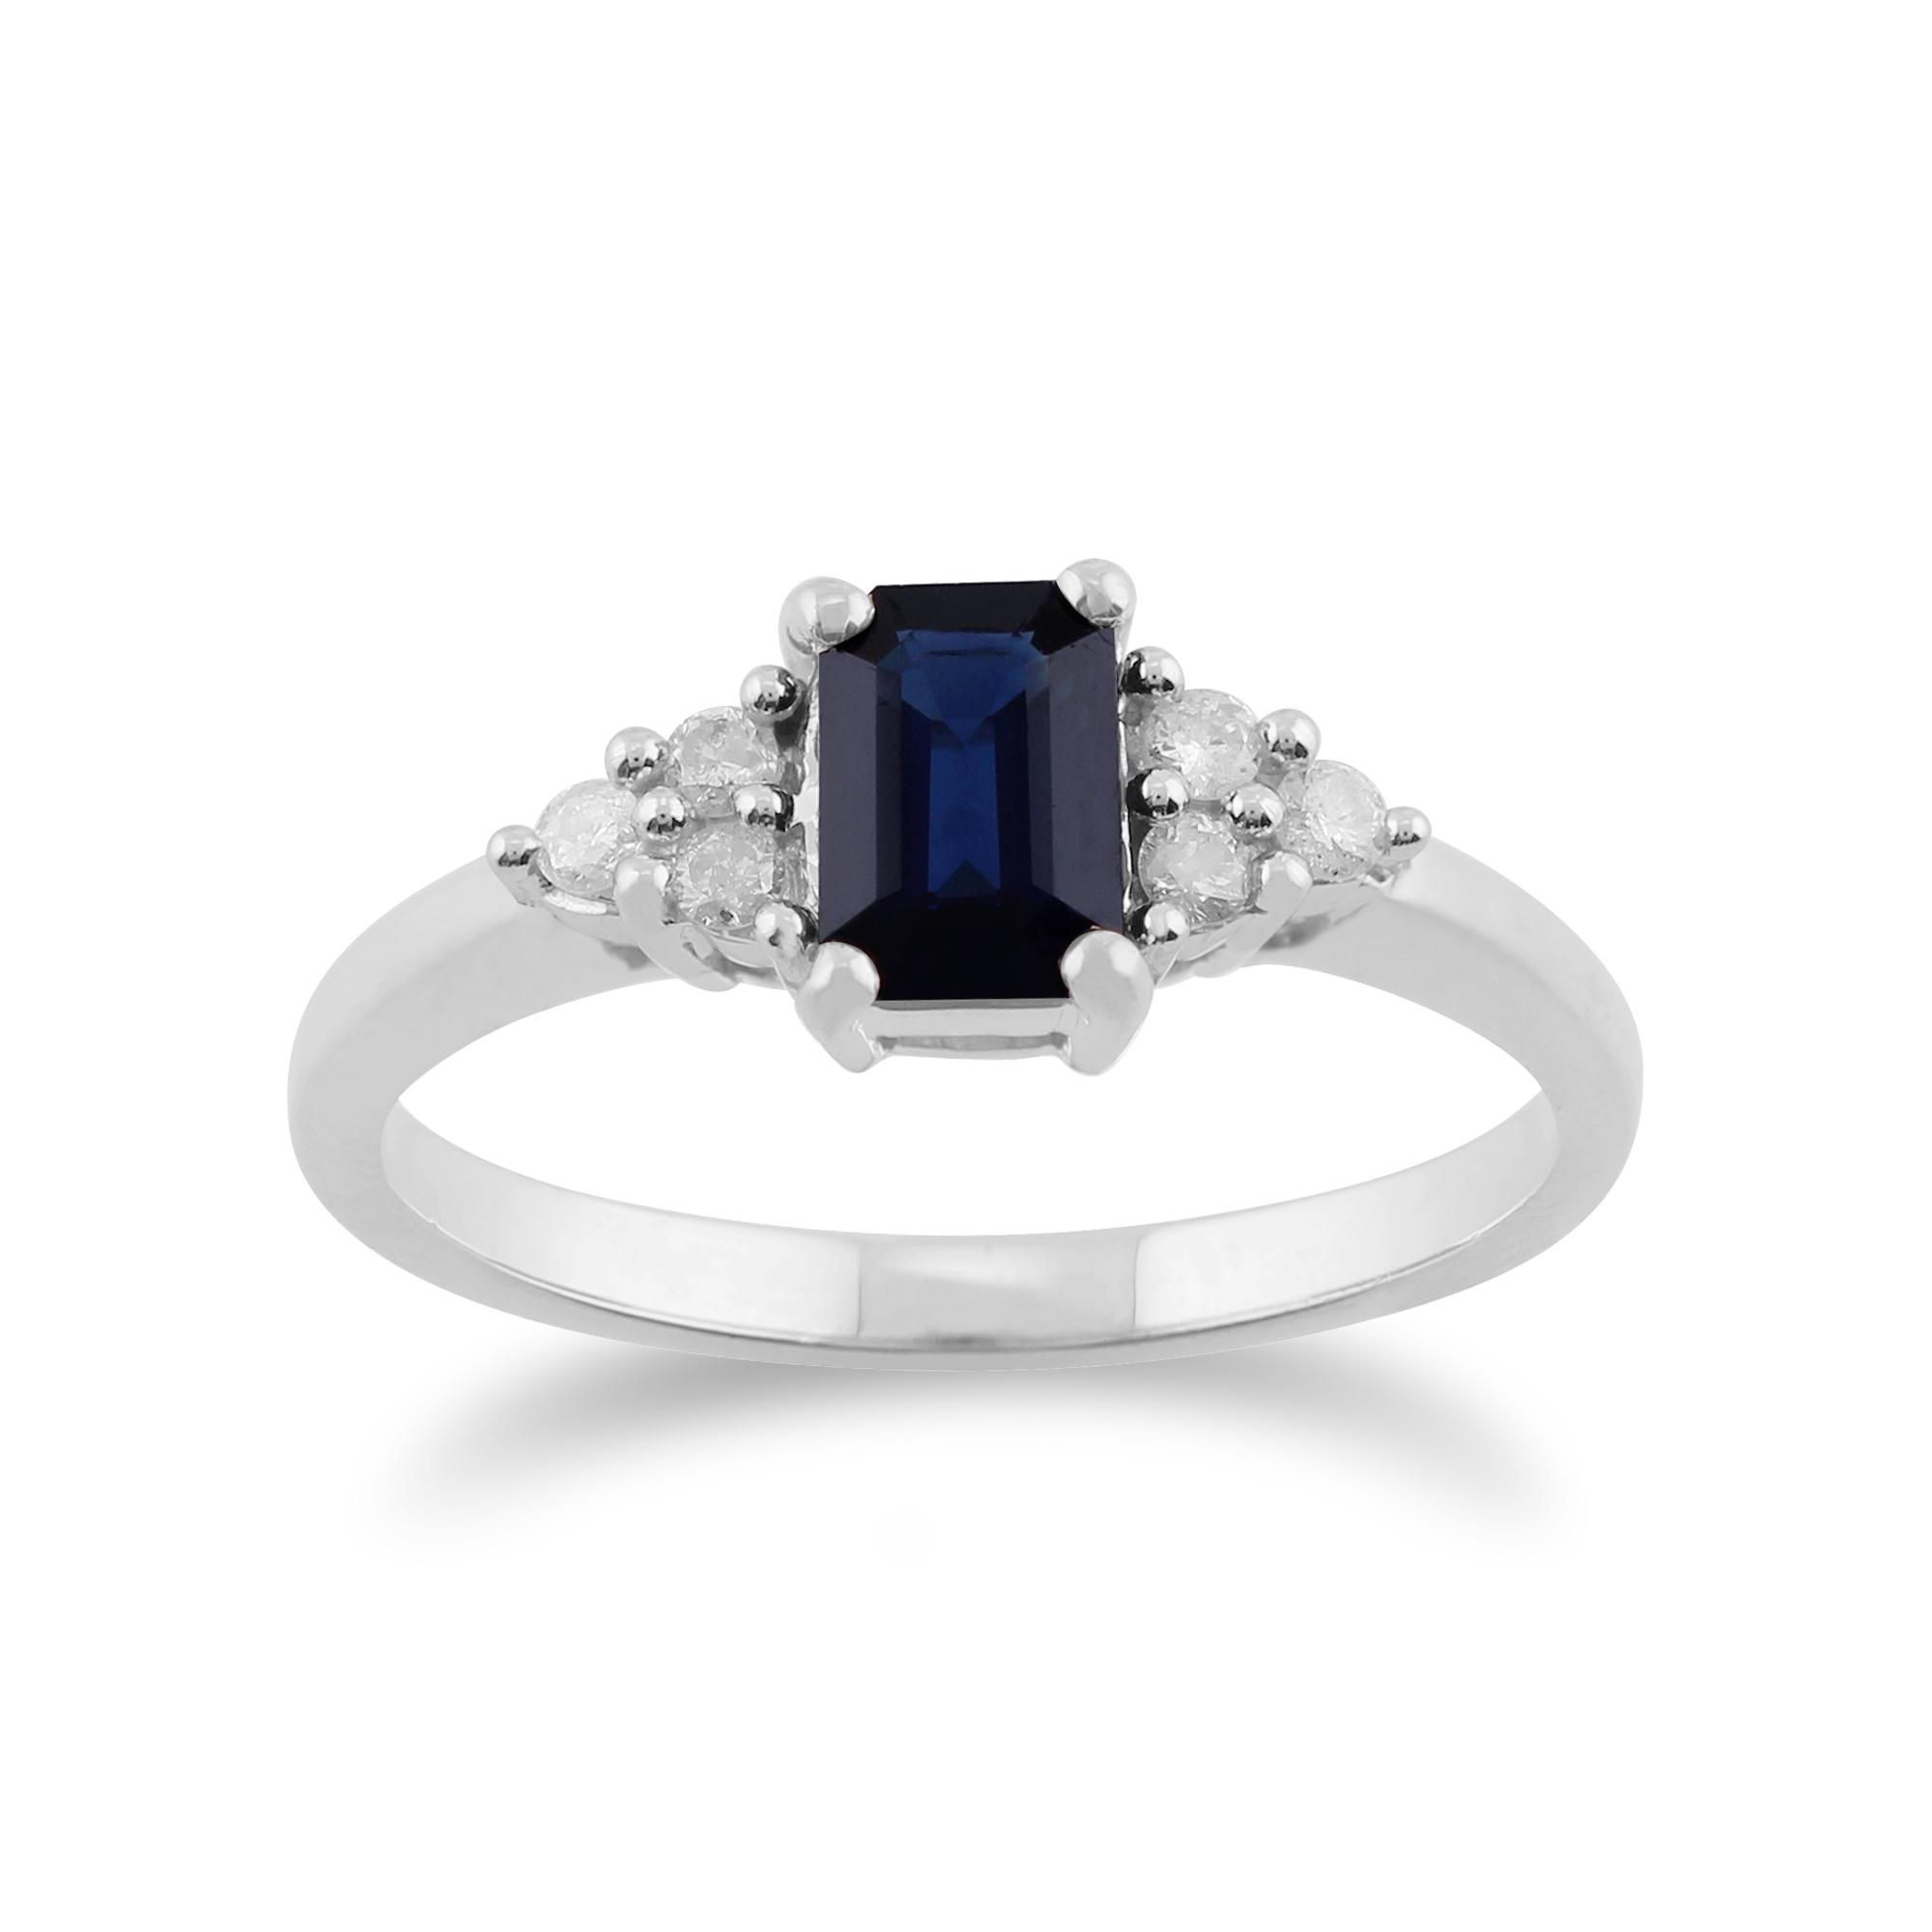 Gemondo 9ct White Gold 0 88ct Blue Sapphire & Diamond Ring